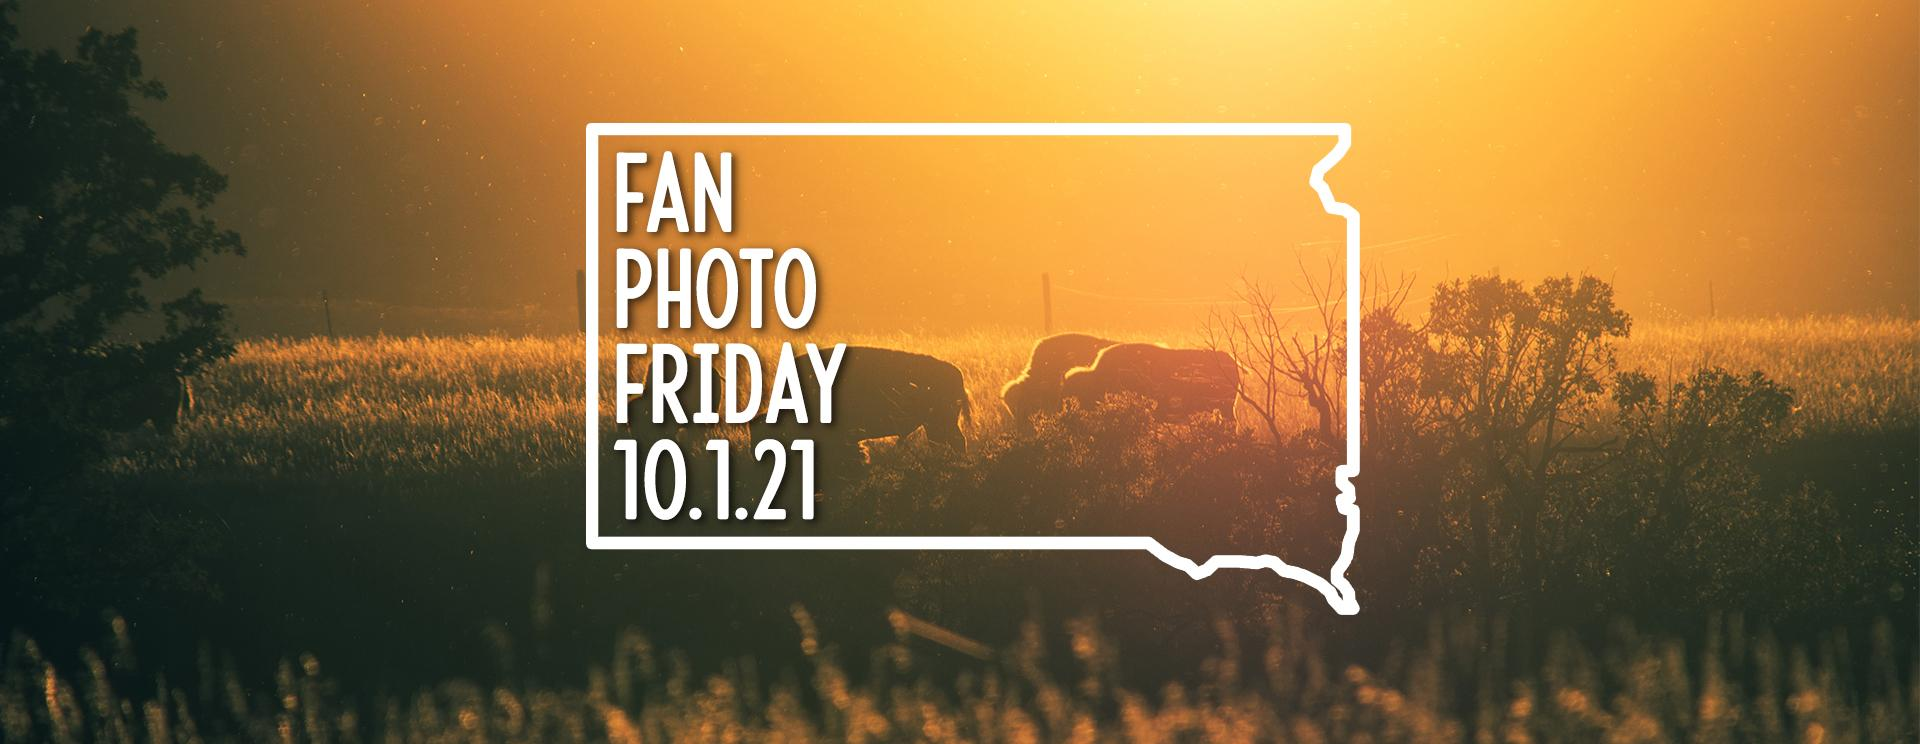 Fan Photo Friday   Oct. 1, 2021